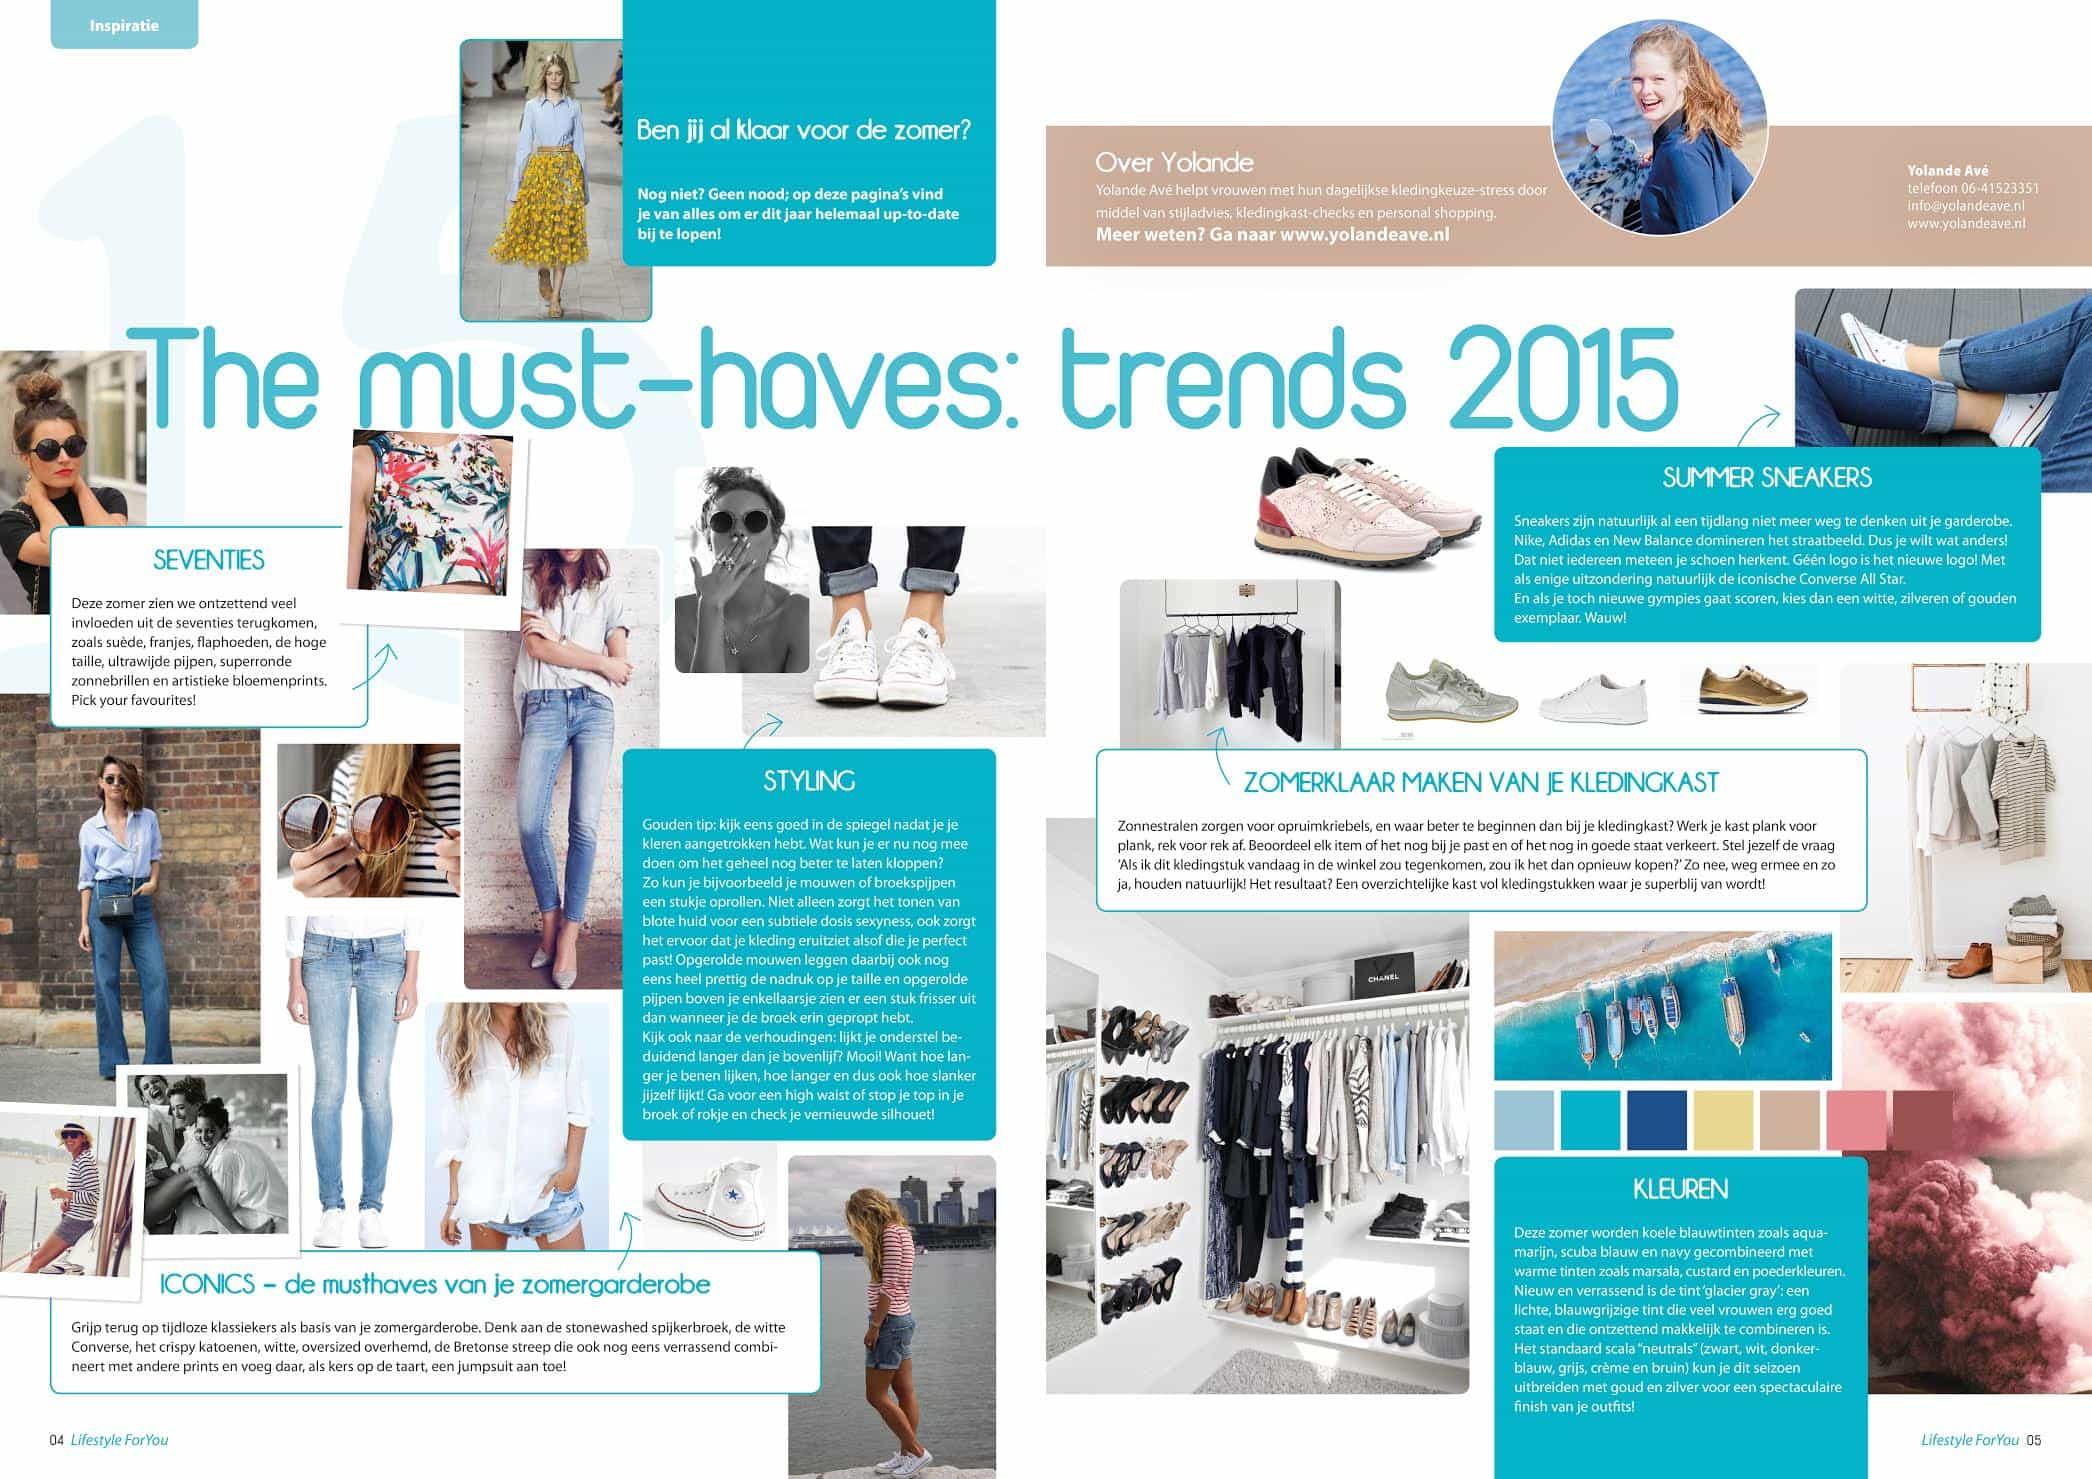 Trends Zomer 2015 Stijladvies Kledingadvies Utrecht Styling Advies Kleding Personal Shopper ForYou Magazine Tijdschrift